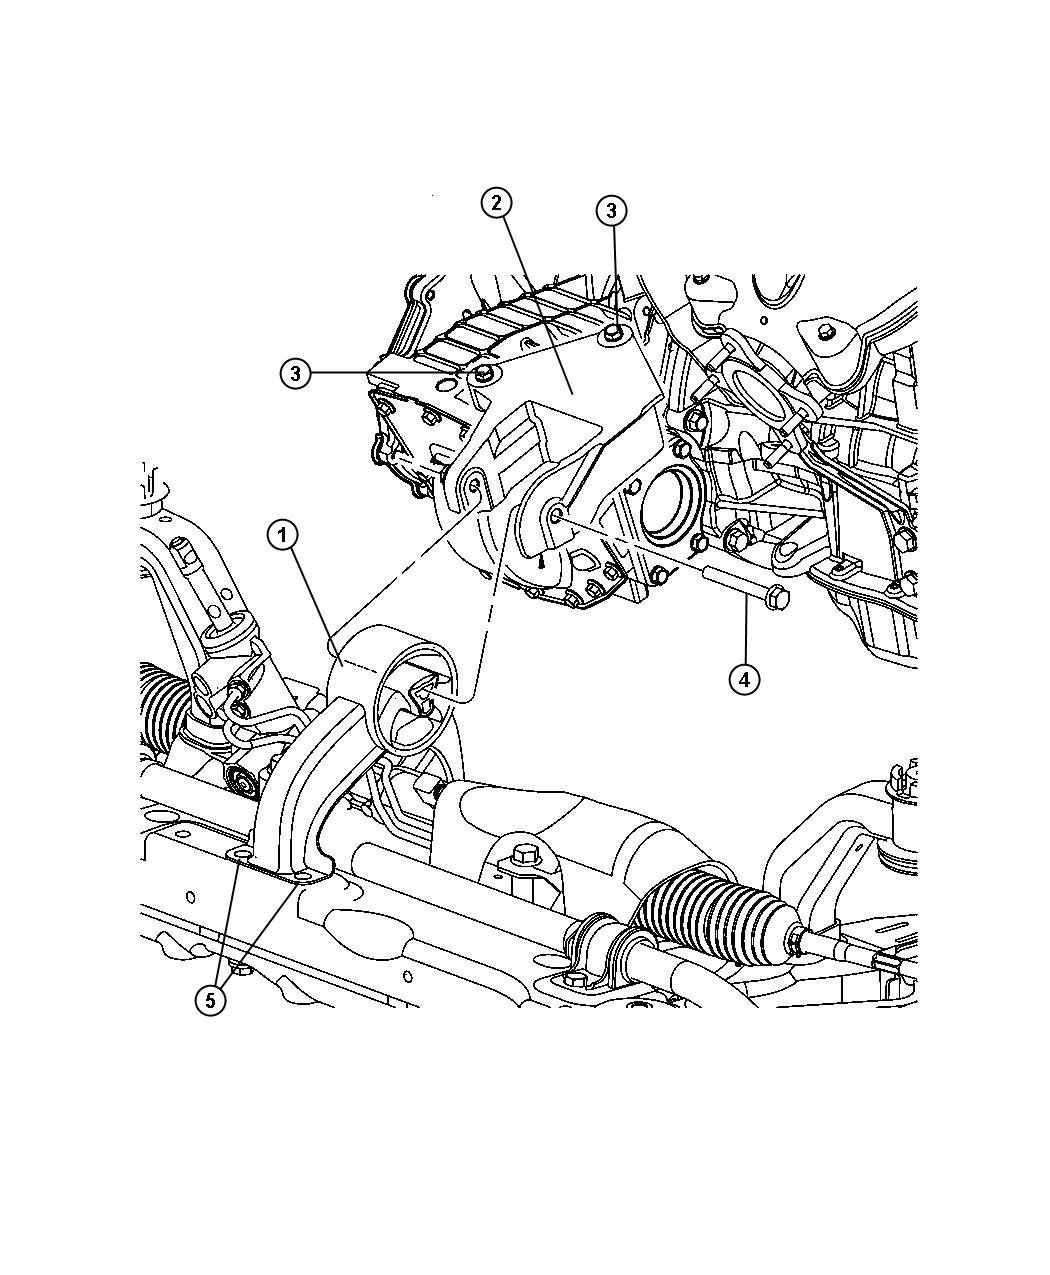 Dodge Avenger Engine Mounting Rear Fwd 2 4l Ed3